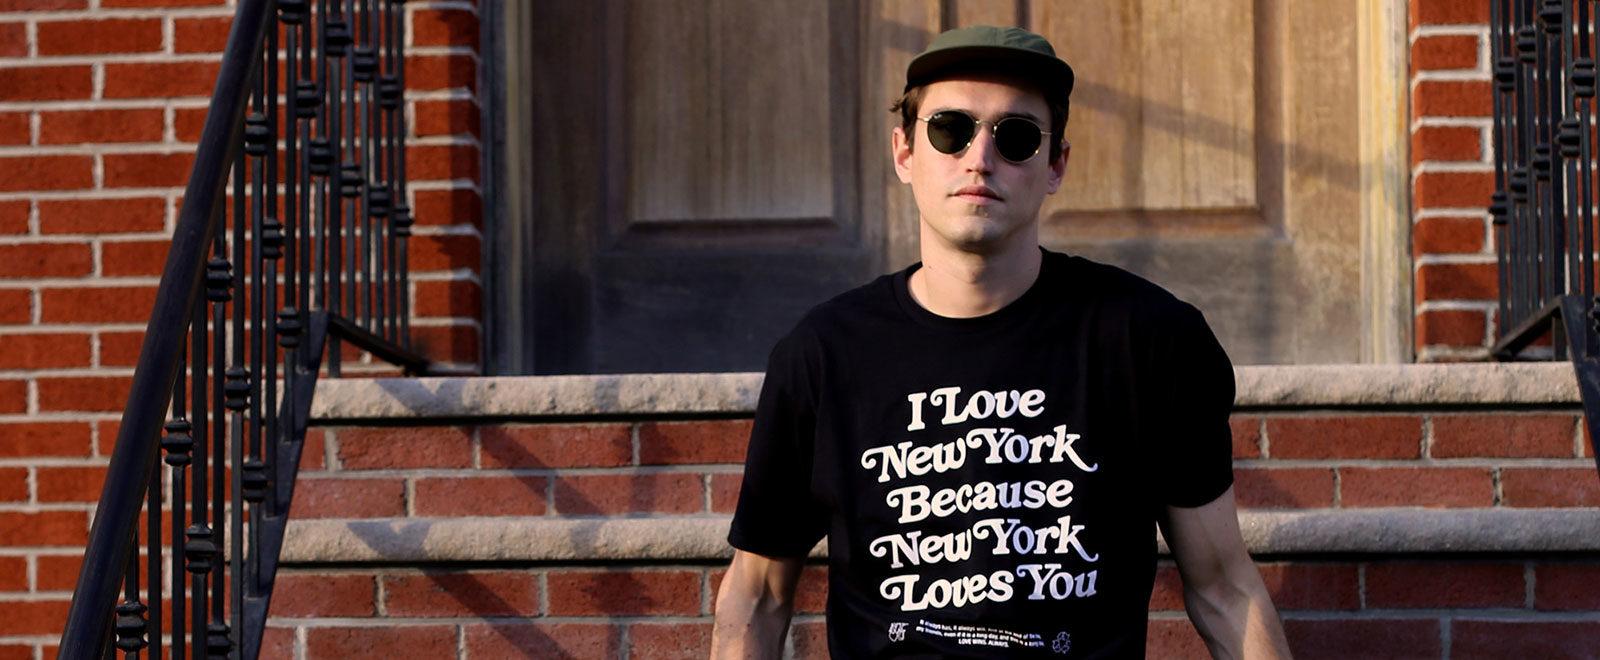 Keegan Sanford New York illustrator art director T-shirt covid-19 robin hood relief fund